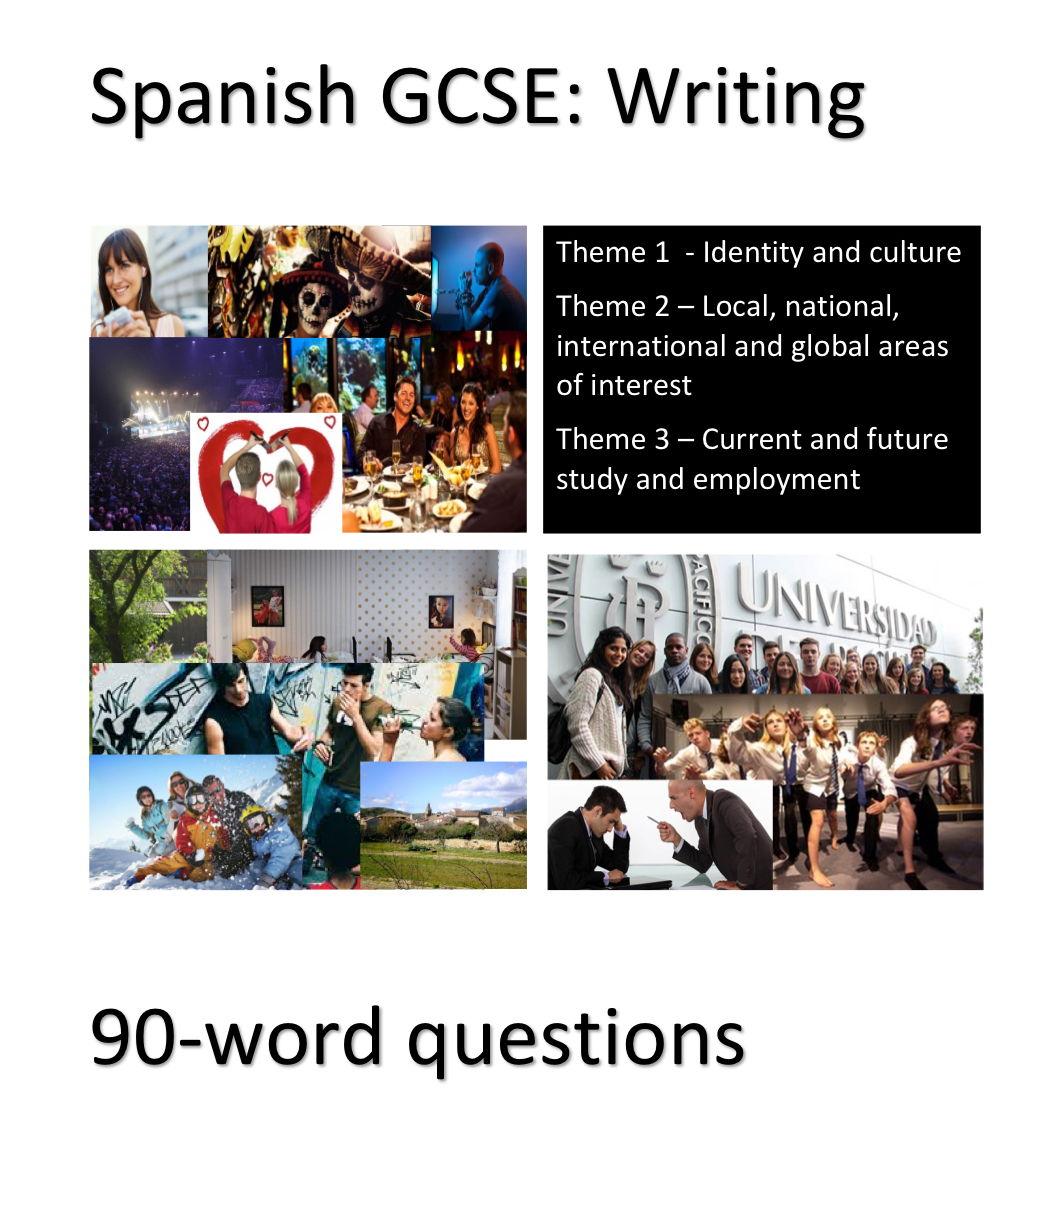 New Spanish GCSE - Writing exam practice: 90-word questions